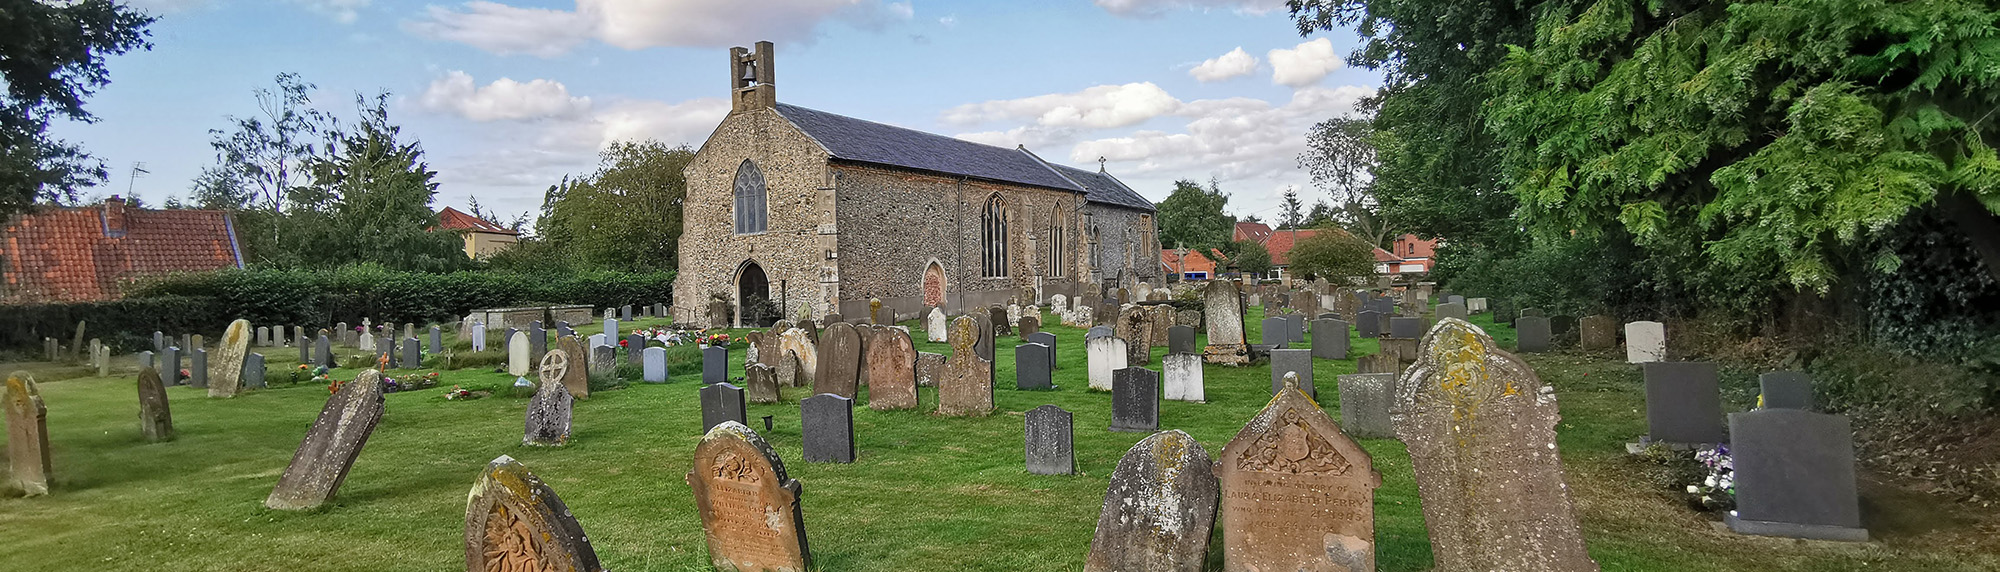 Briston churchyard